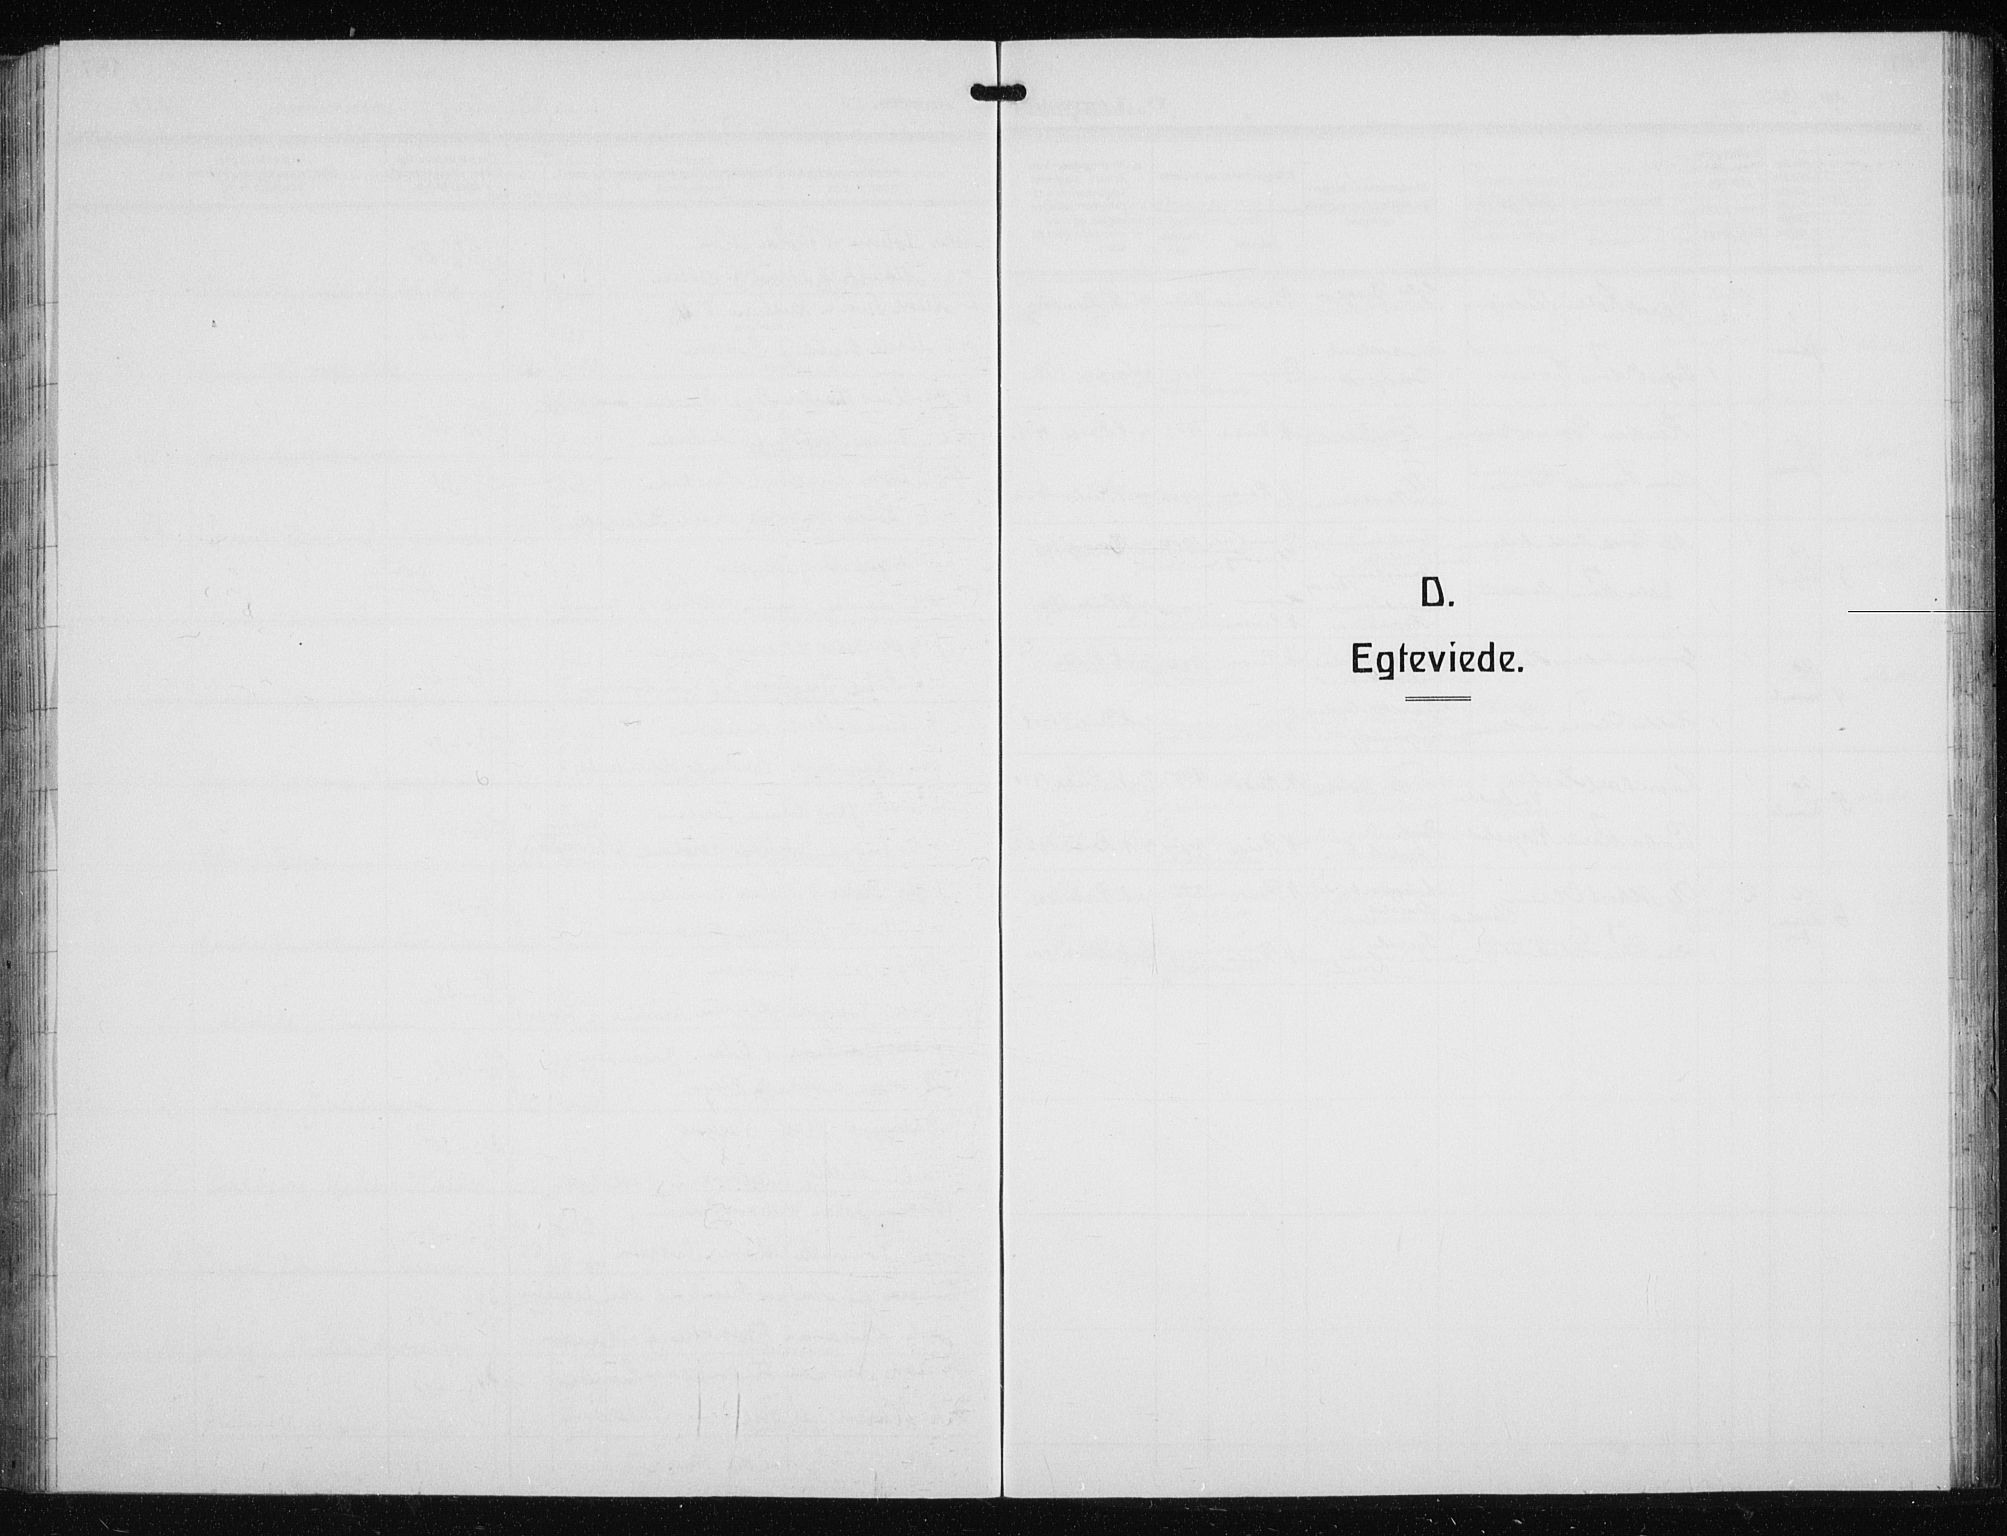 SATØ, Skjervøy sokneprestkontor, H/Ha/Hab/L0023klokker: Klokkerbok nr. 23, 1927-1943